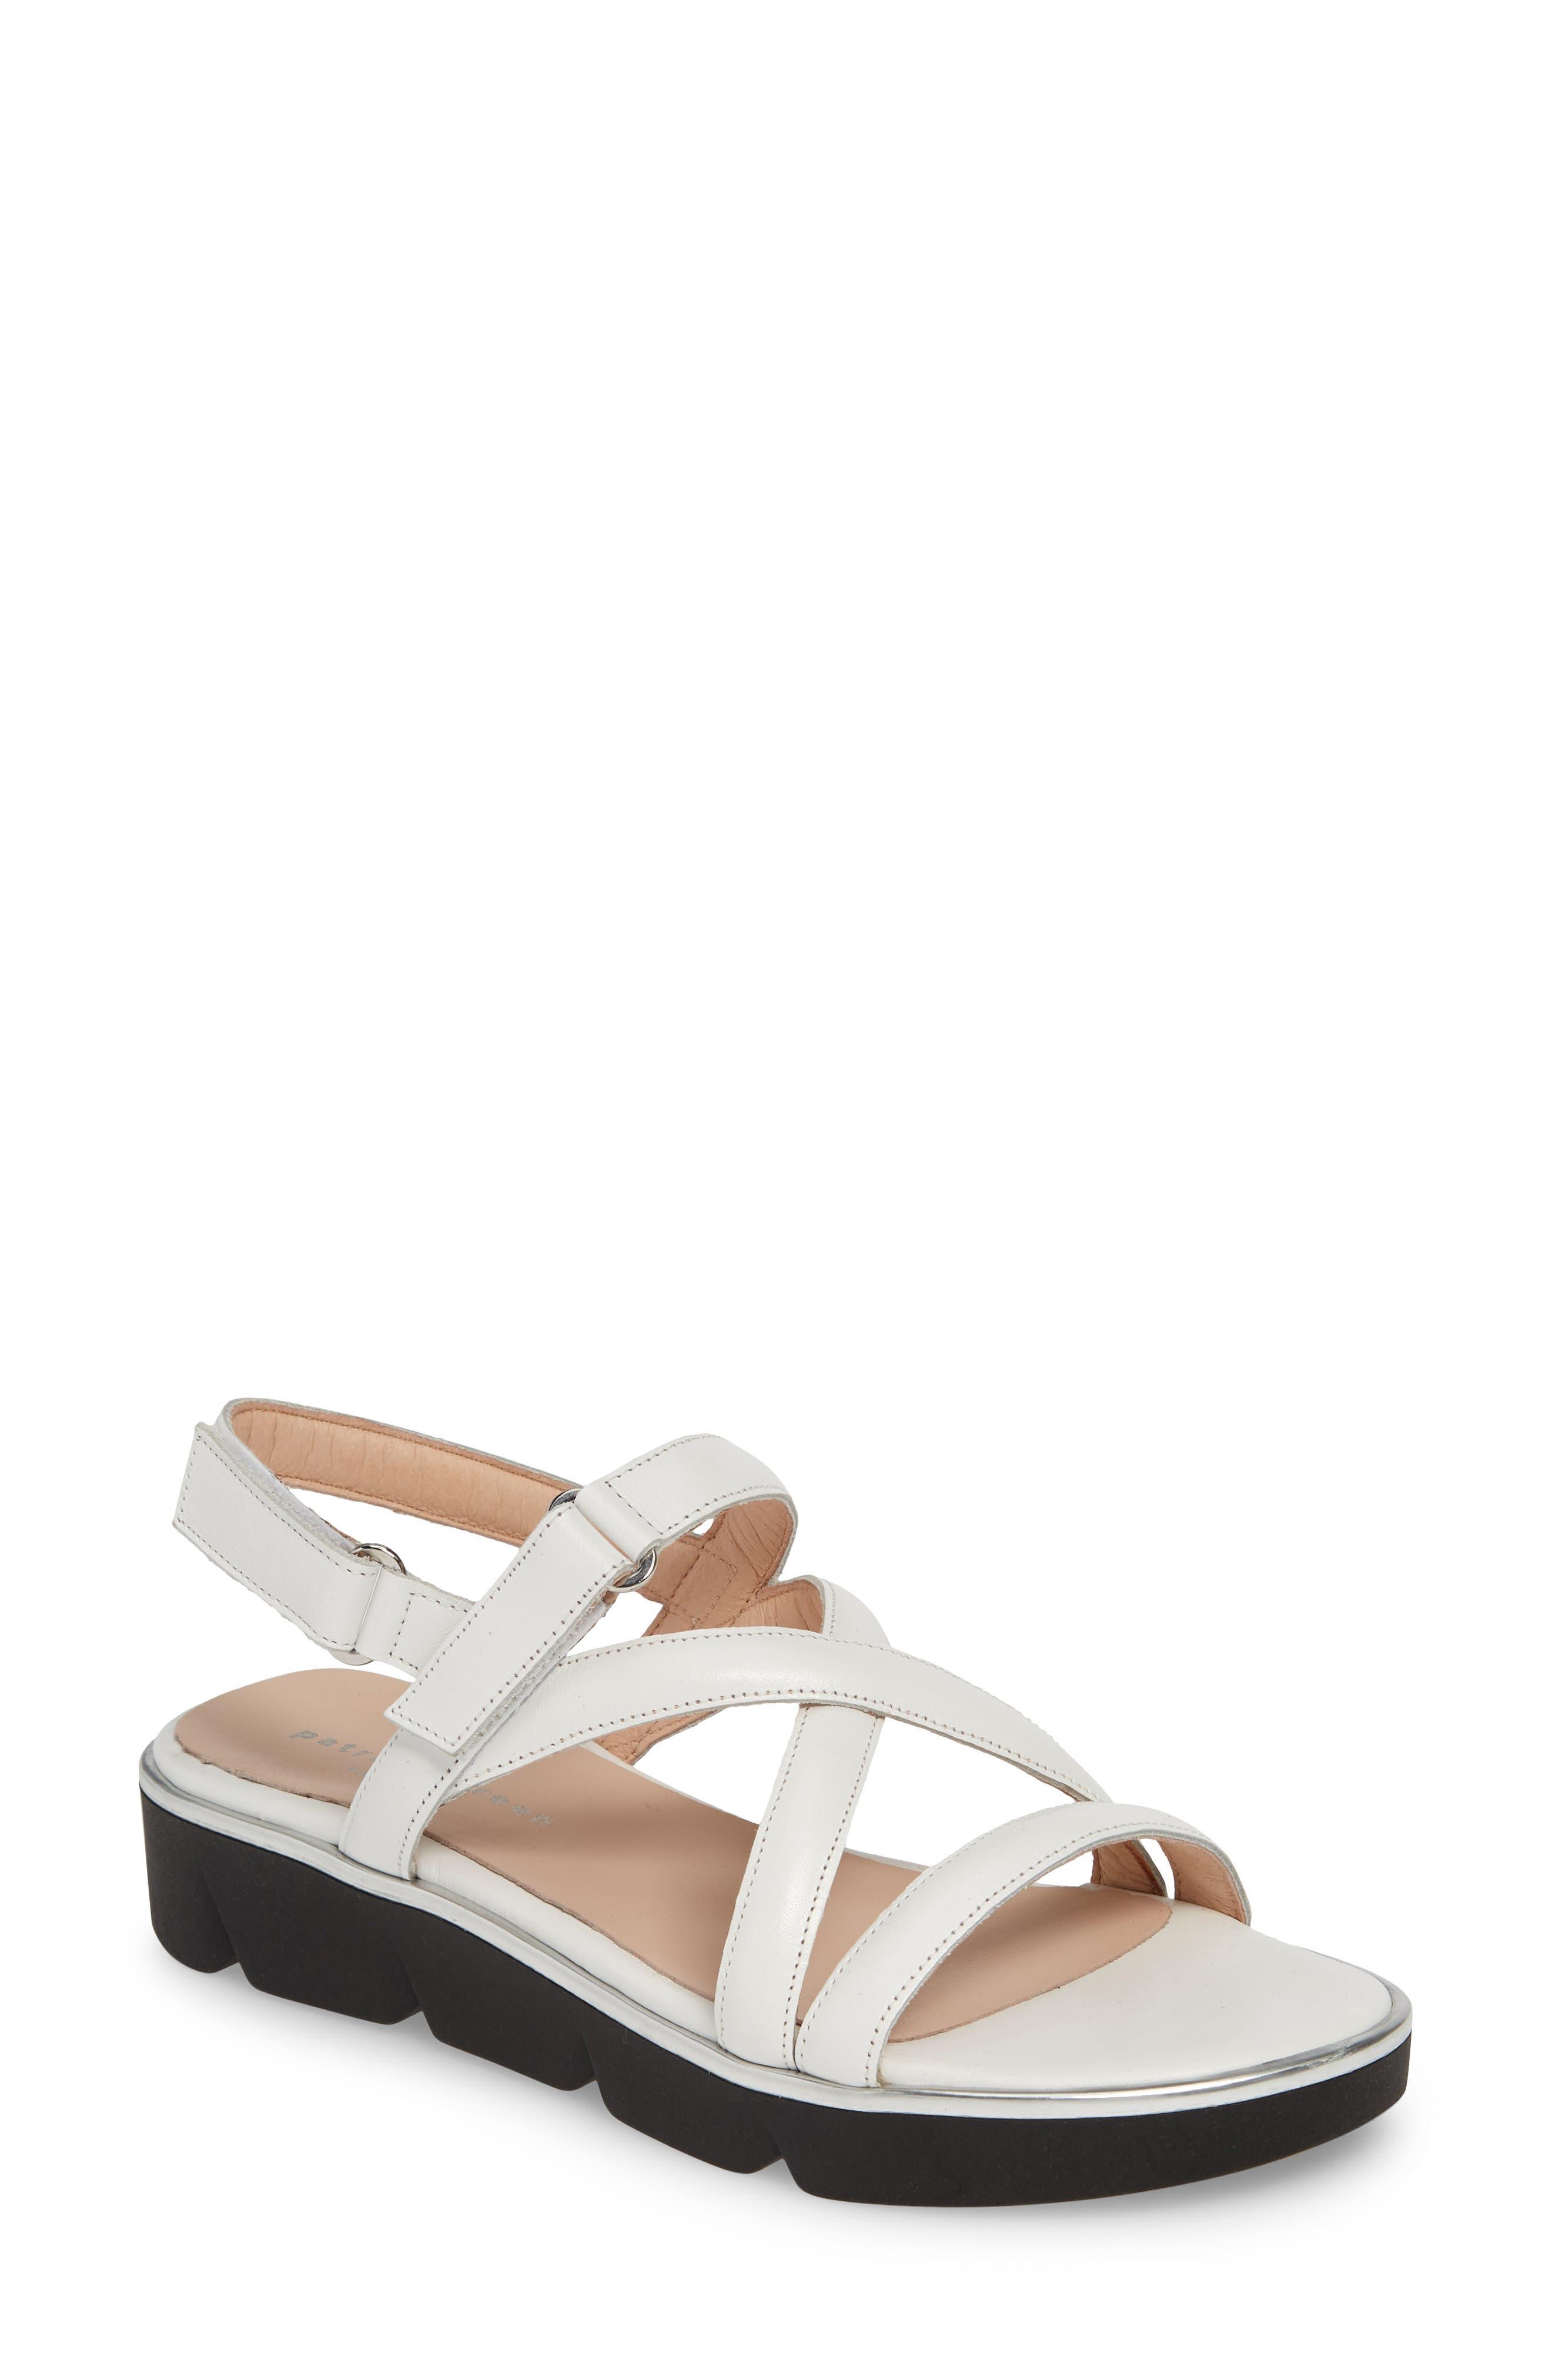 Patricia Green Capri Platform Slingback Sandal, White